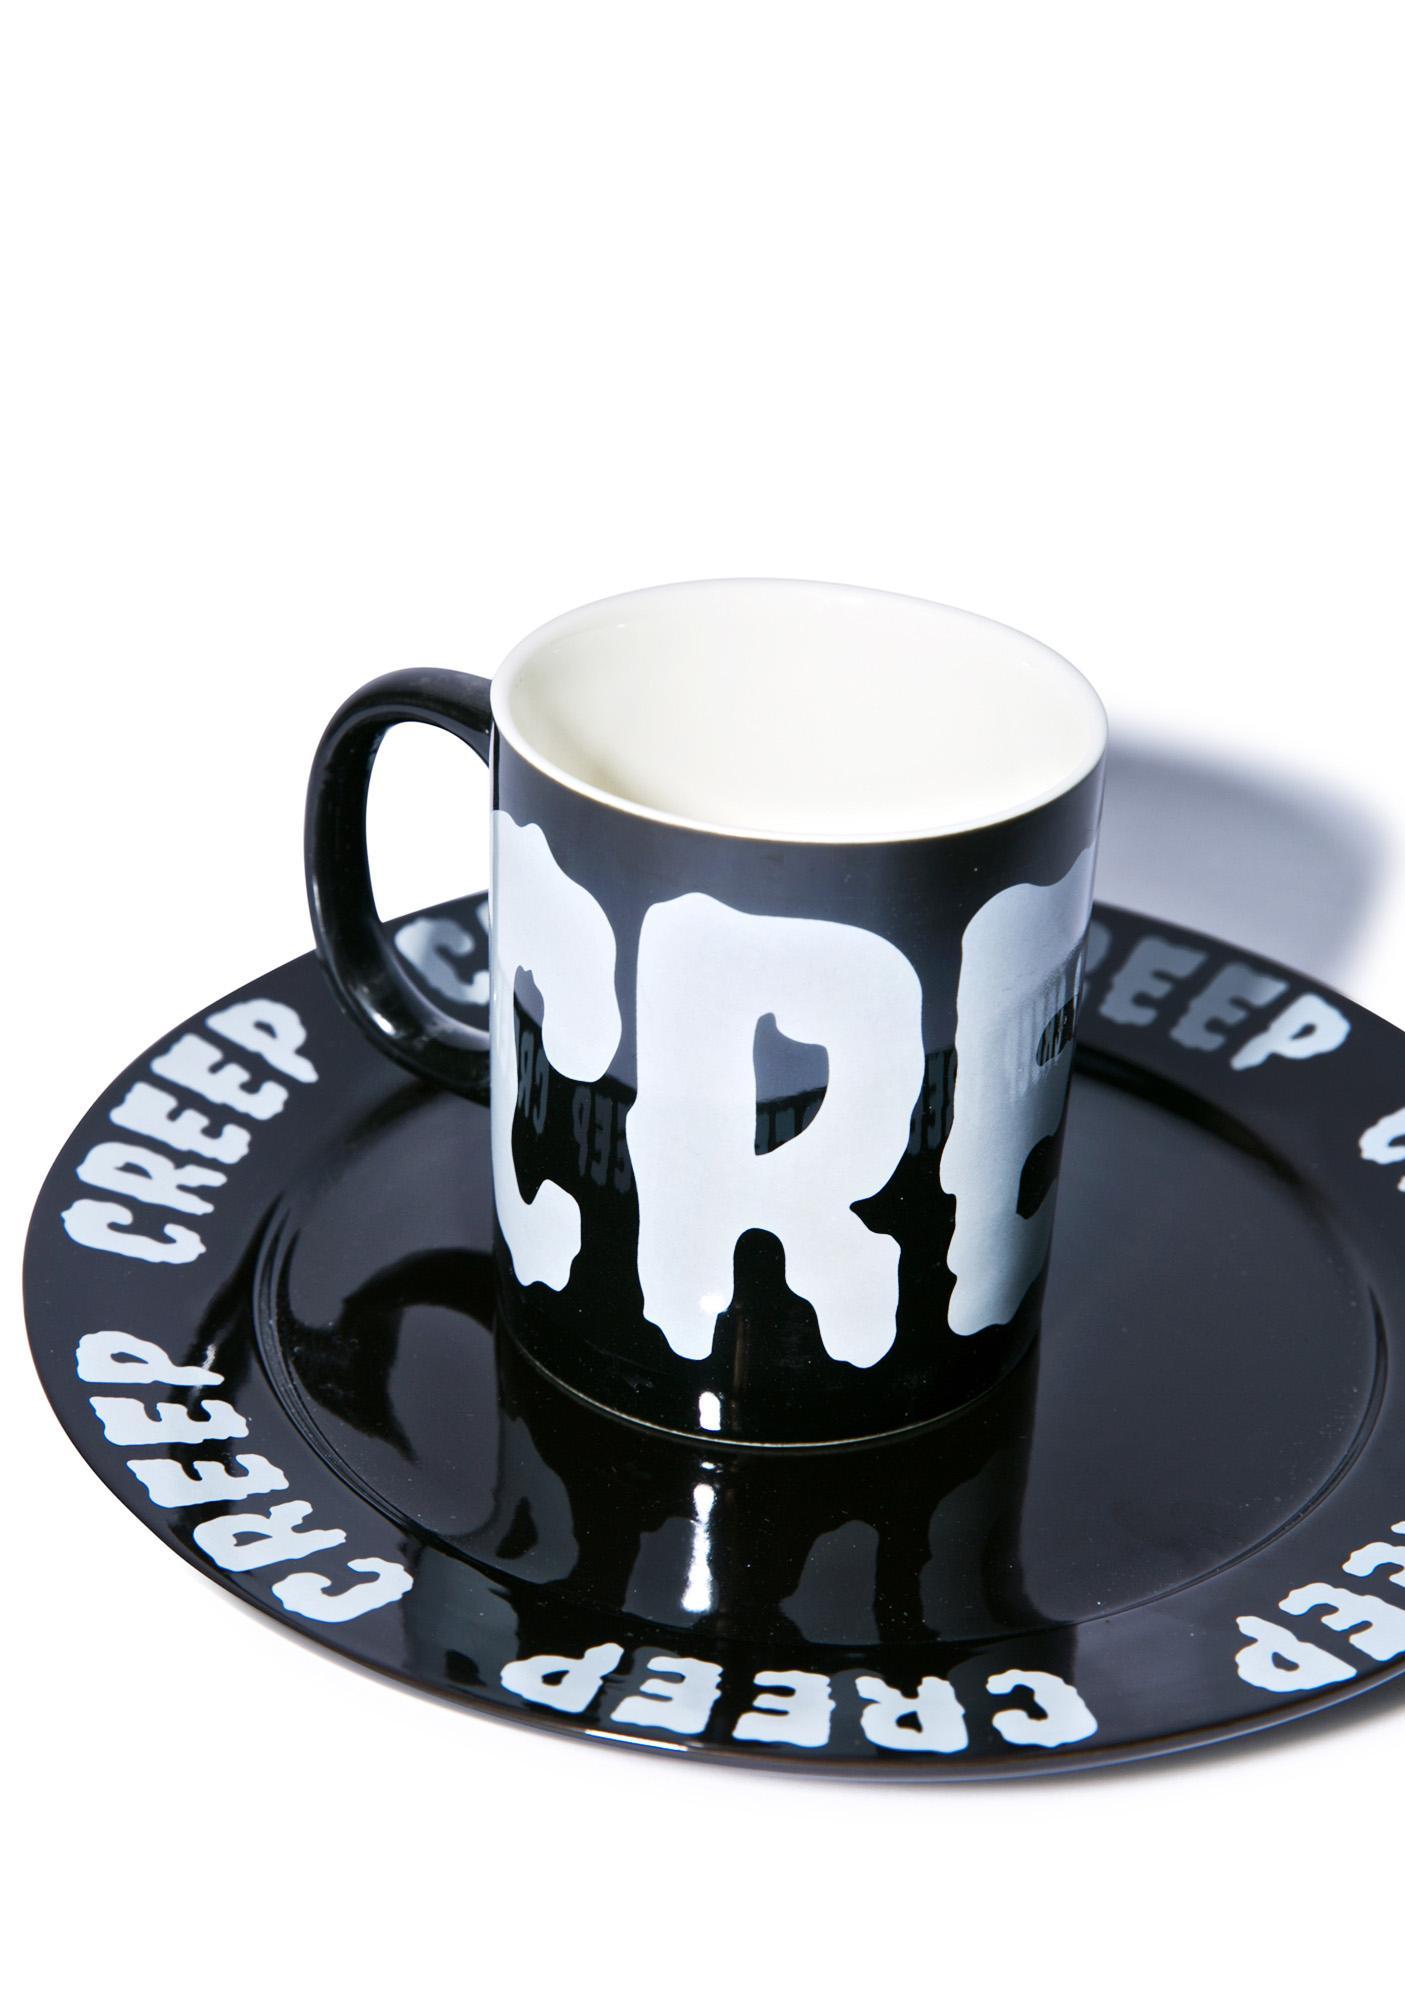 Sourpuss Clothing Creepy Coffee Mug